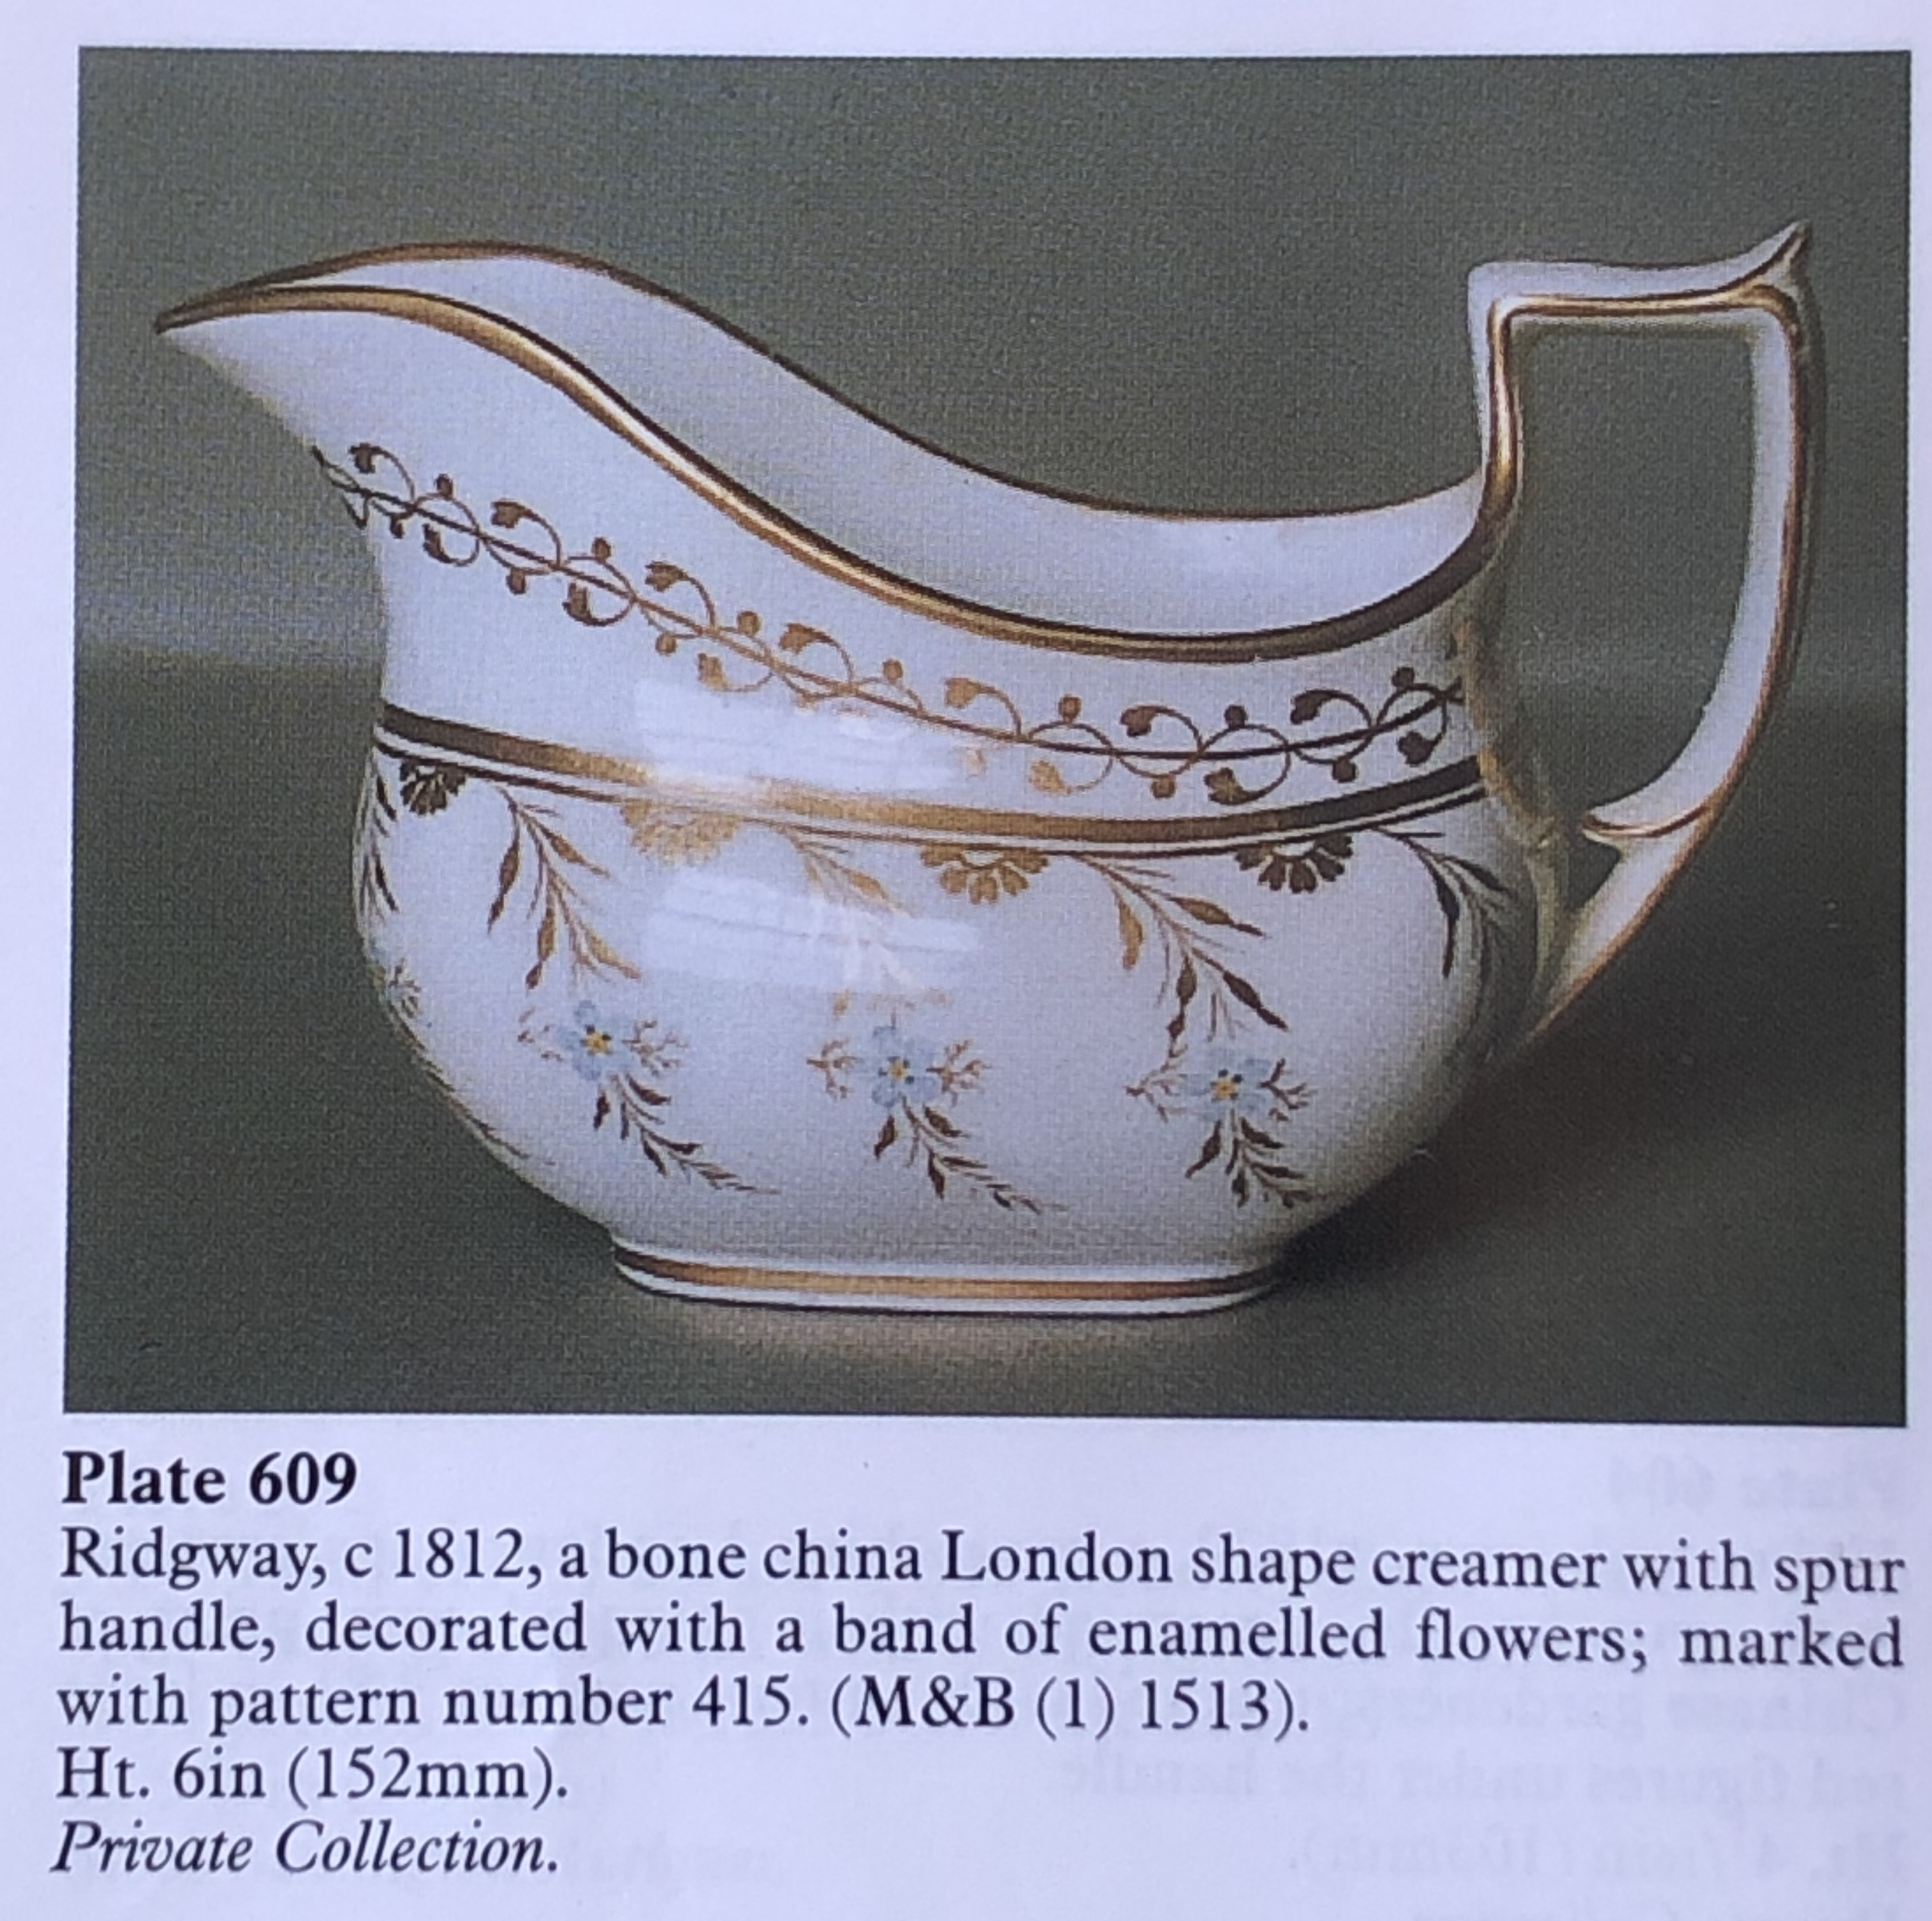 Ridgway jug c.1820